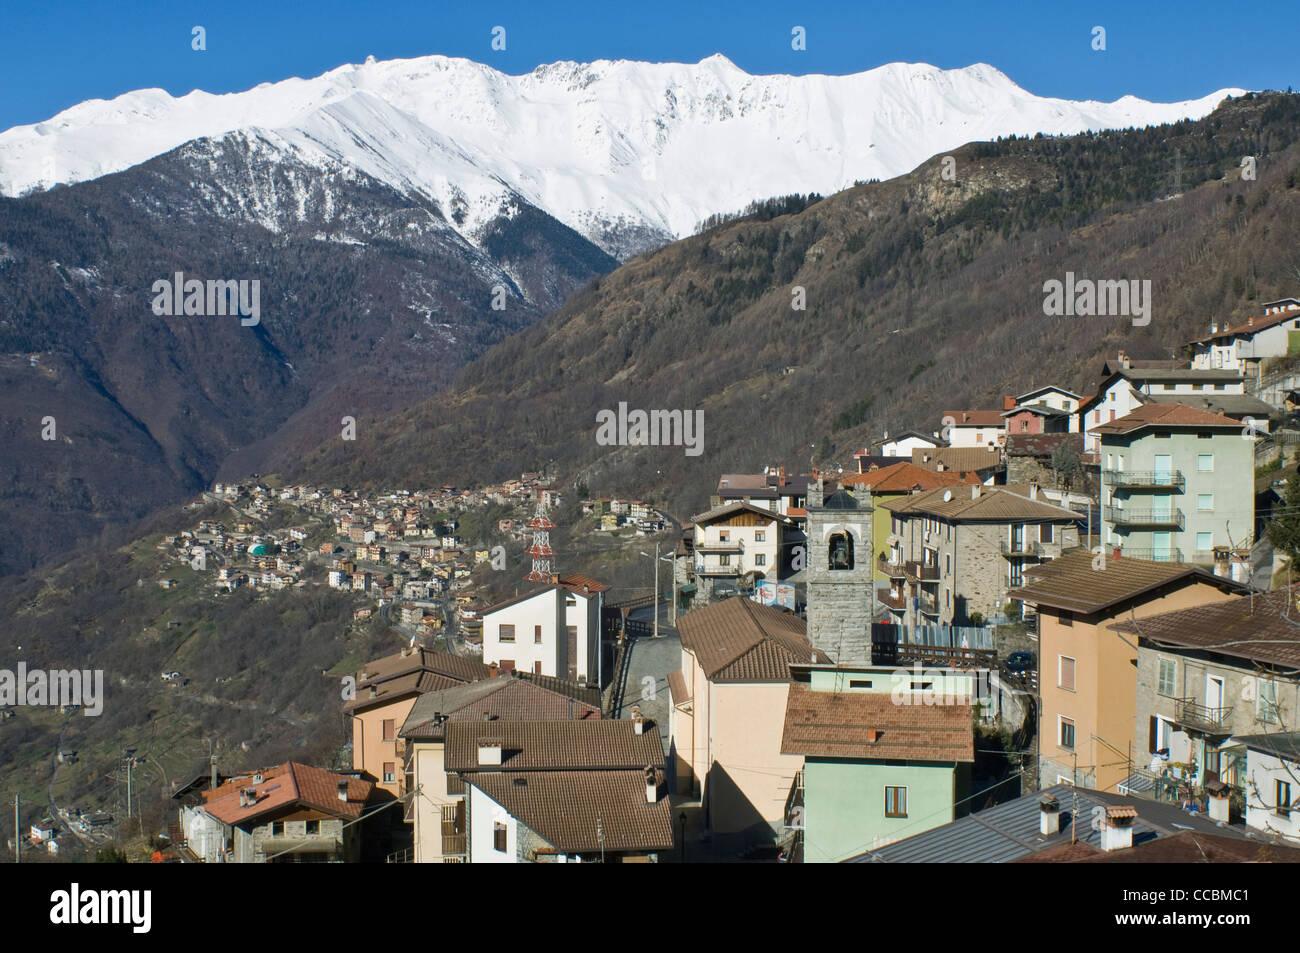 monte village, berzo demo, italy - Stock Image